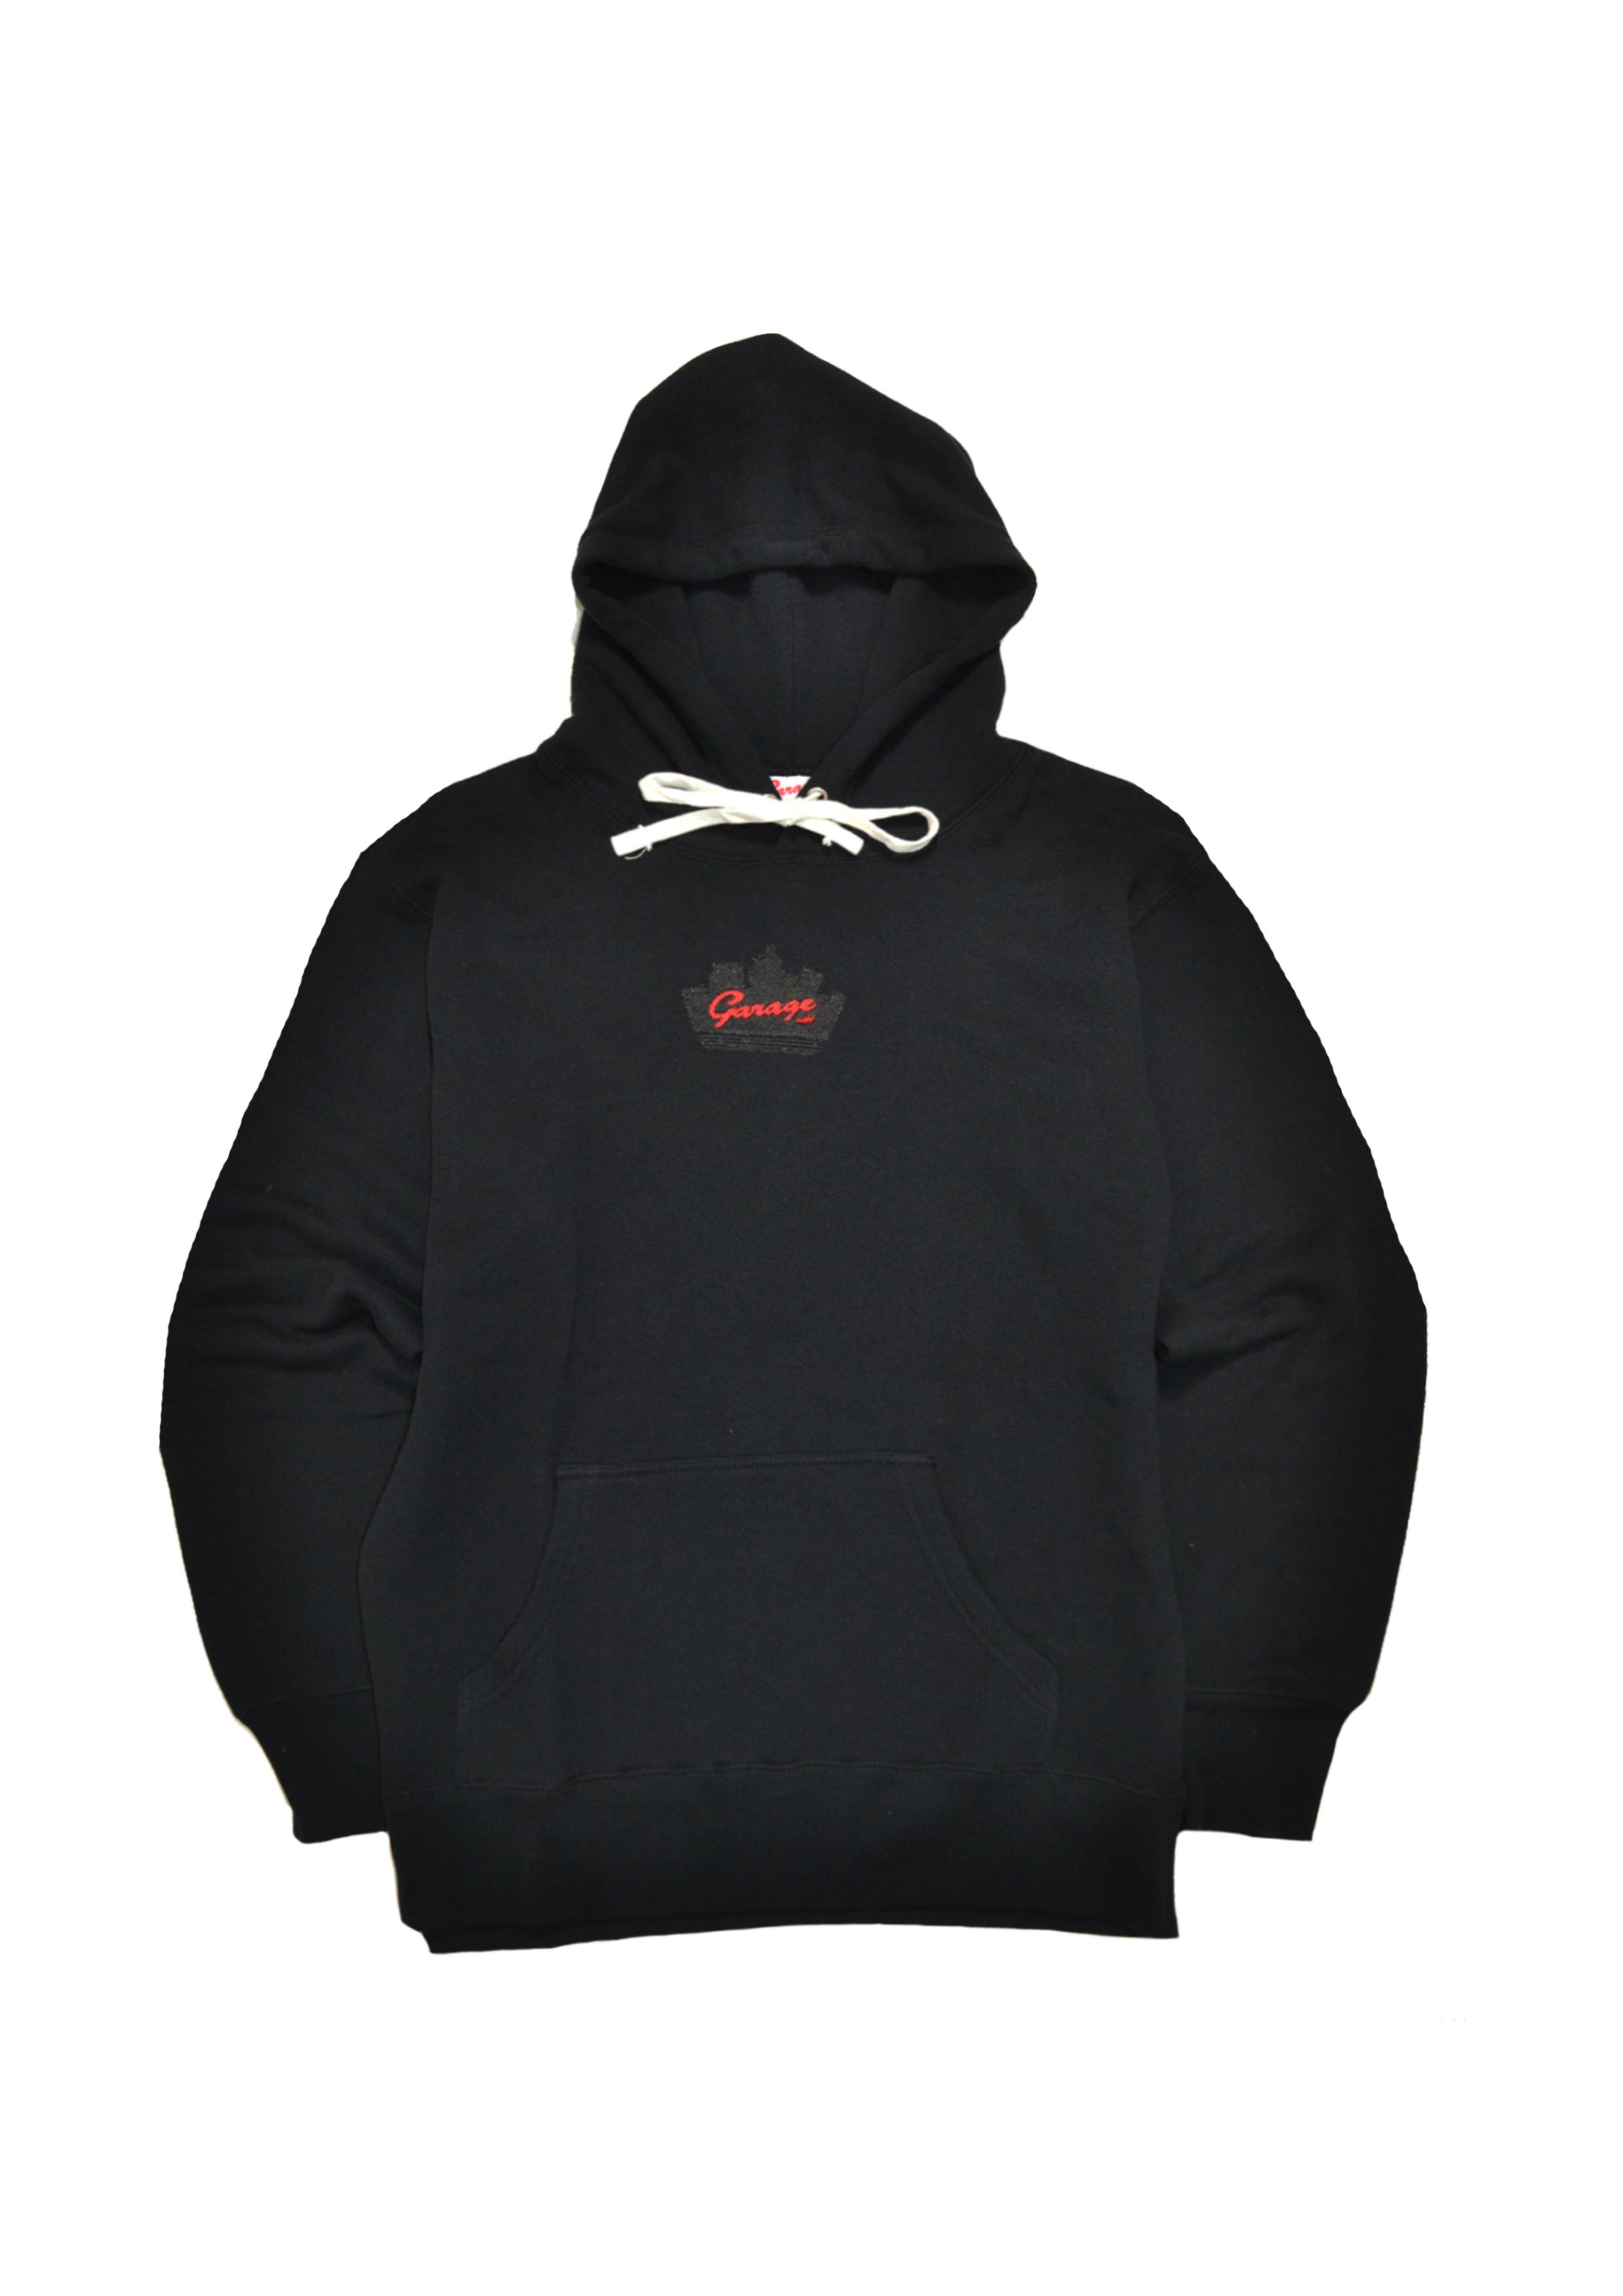 Silhouette logo hoodie Black